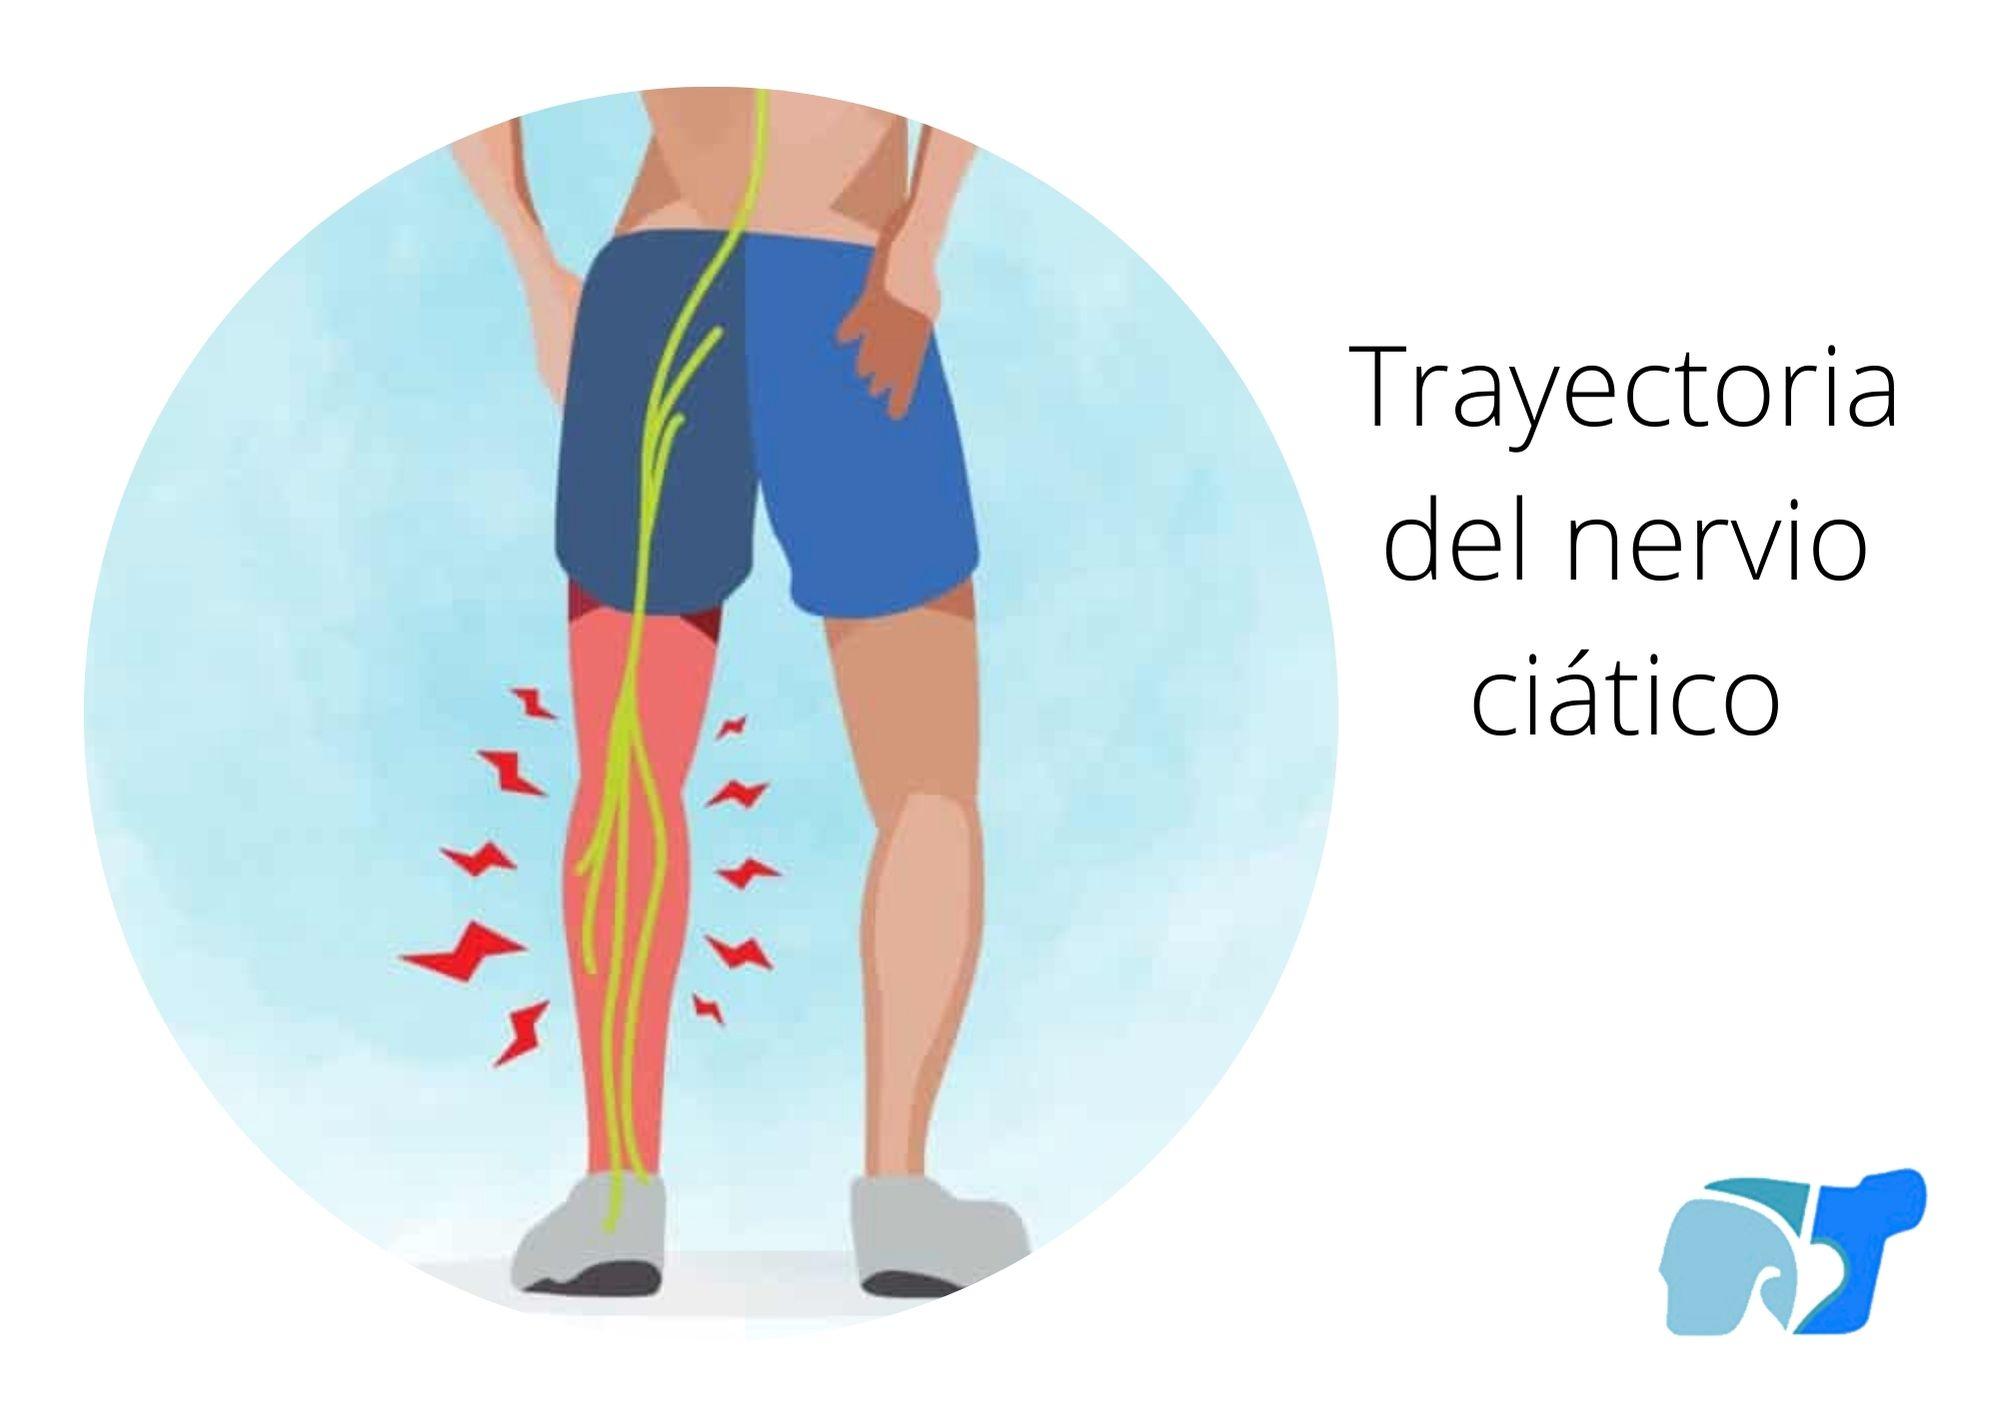 trayectoria-del-nervio-ciatico